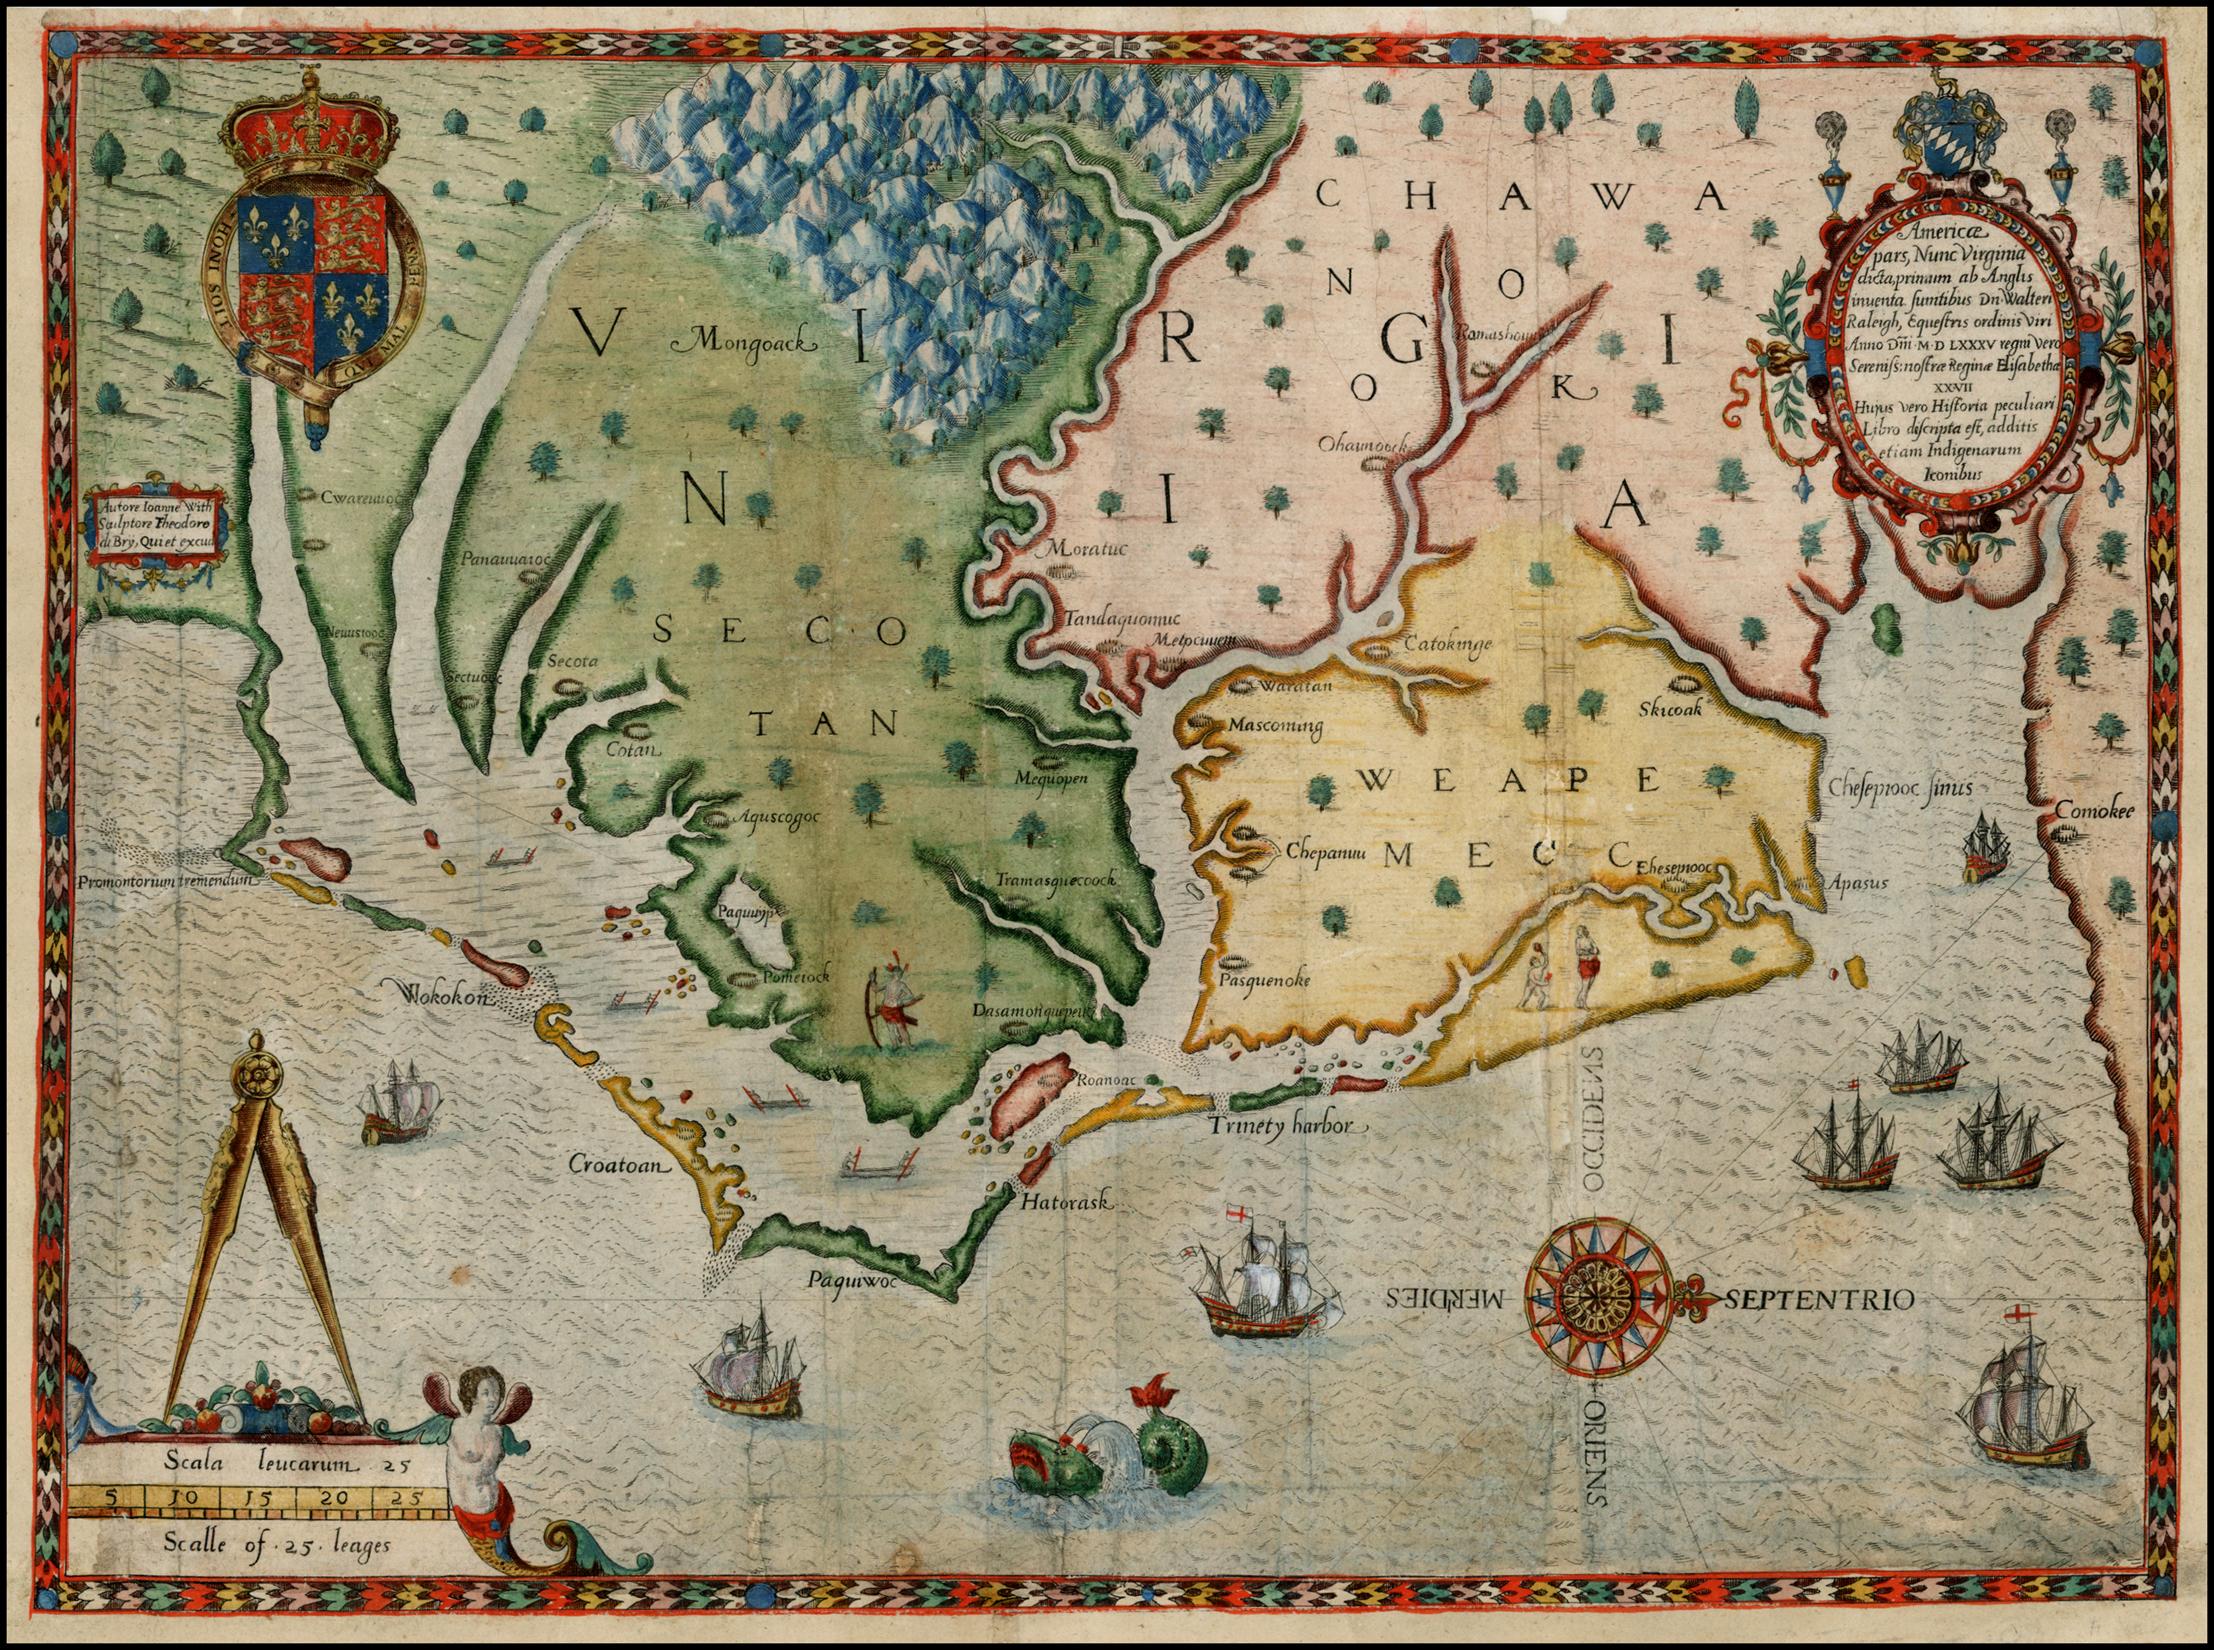 Virginia and Carolina Colonies. John White Exploration map. Circa 1585.